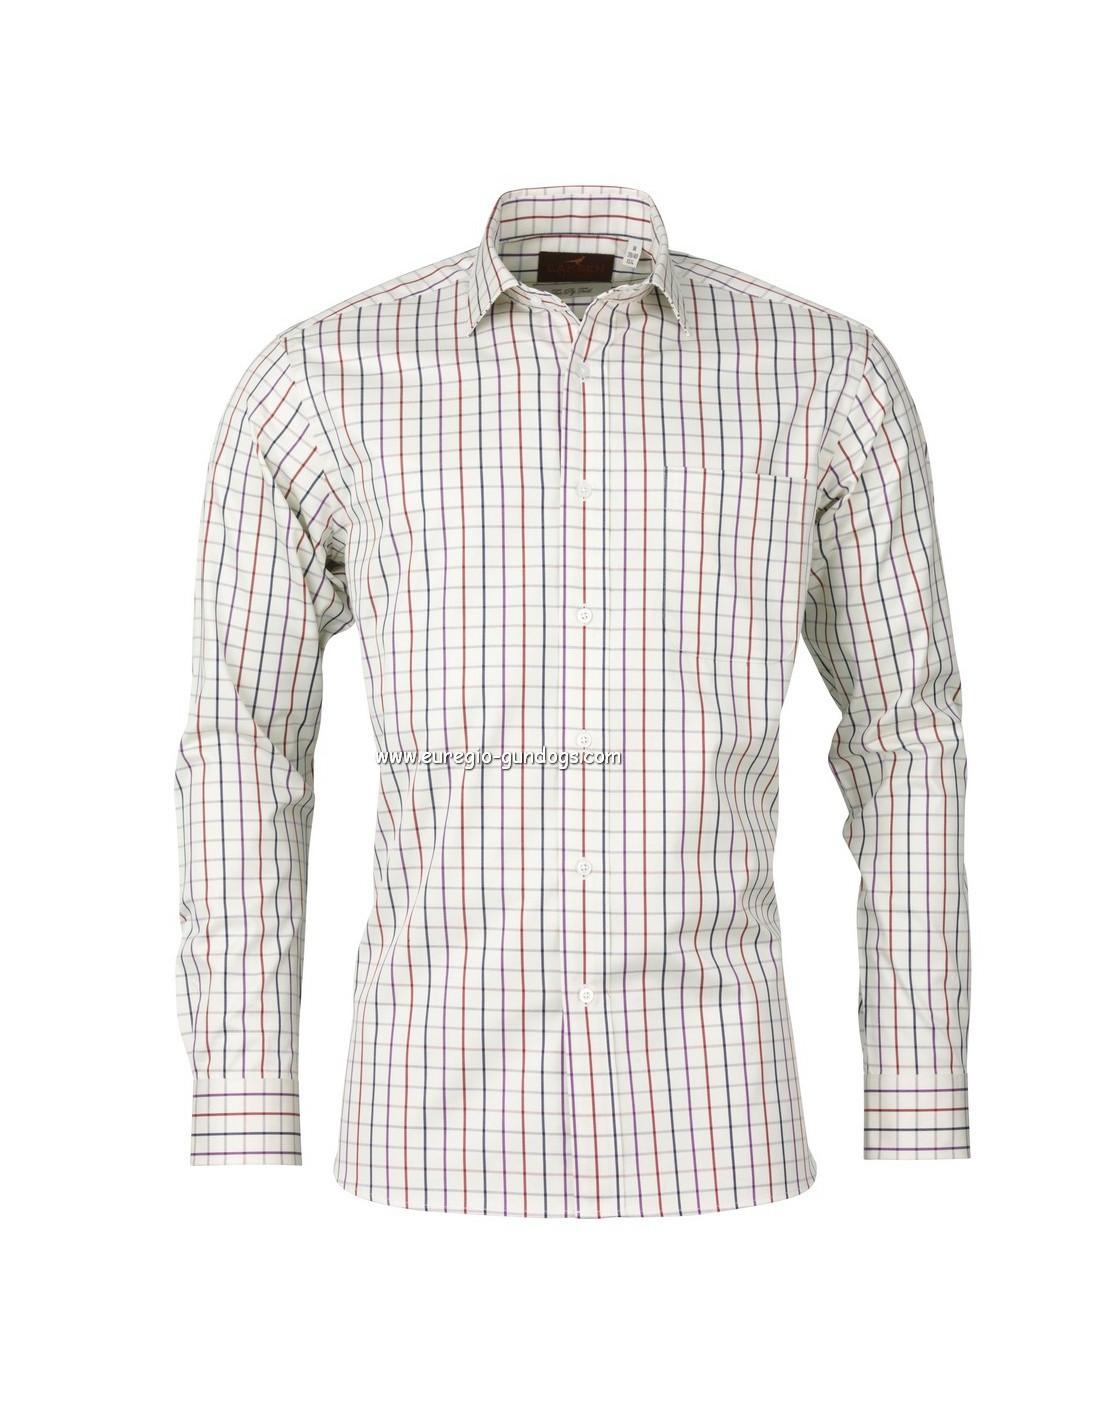 Laksen Men's Shirt Charlie Euregio Gundog Store